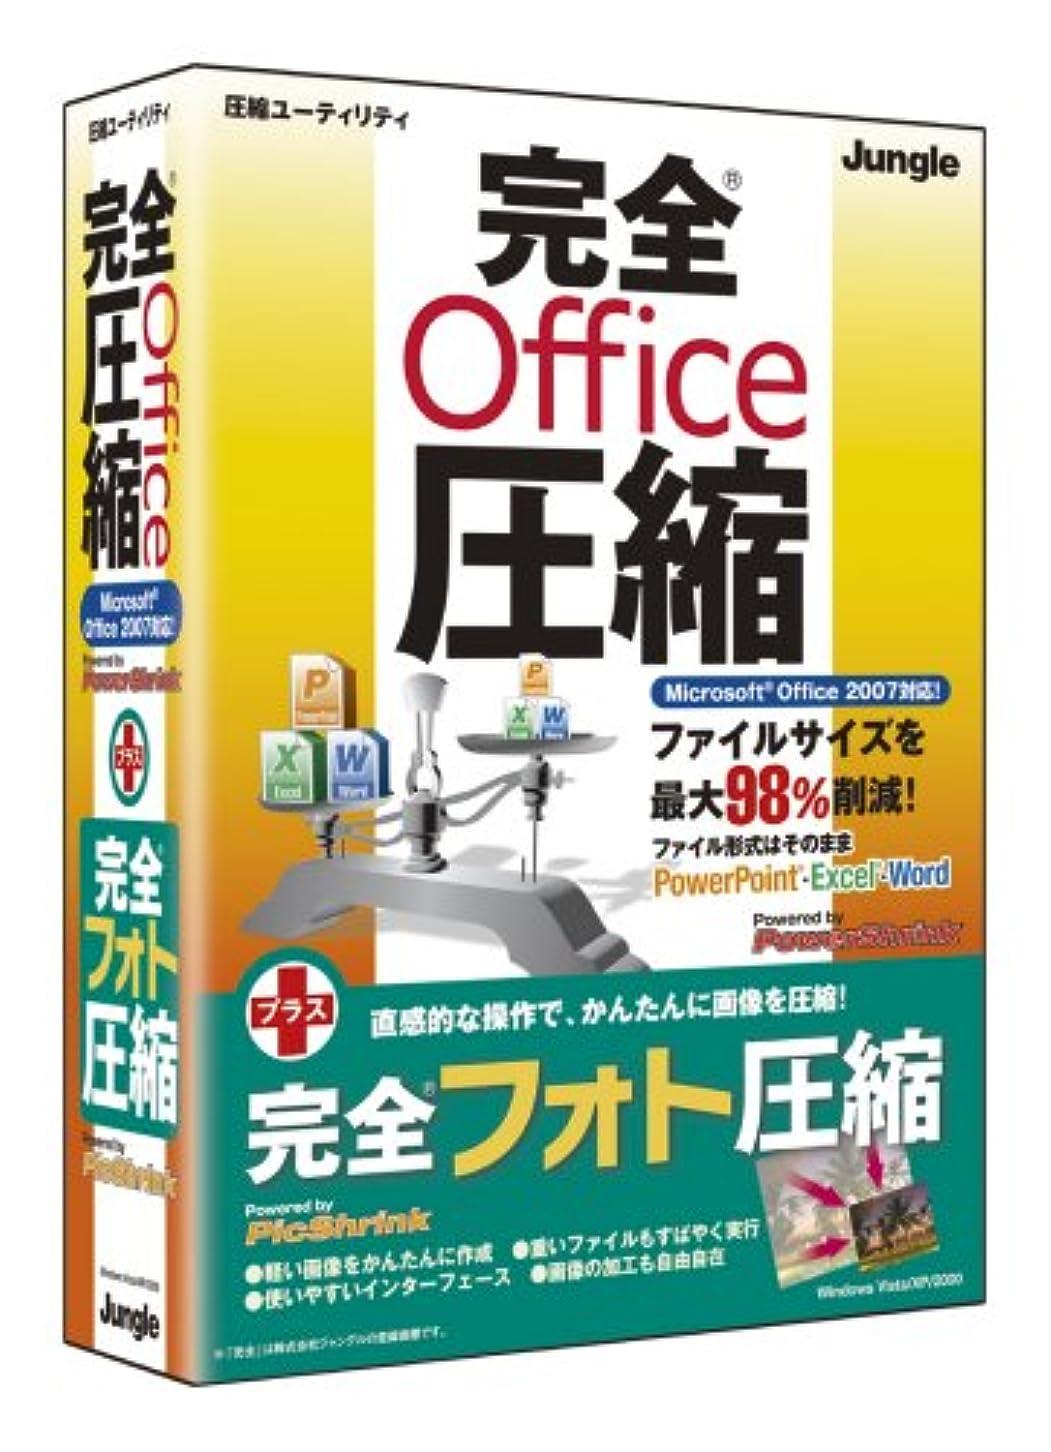 完全Office圧縮 Plus